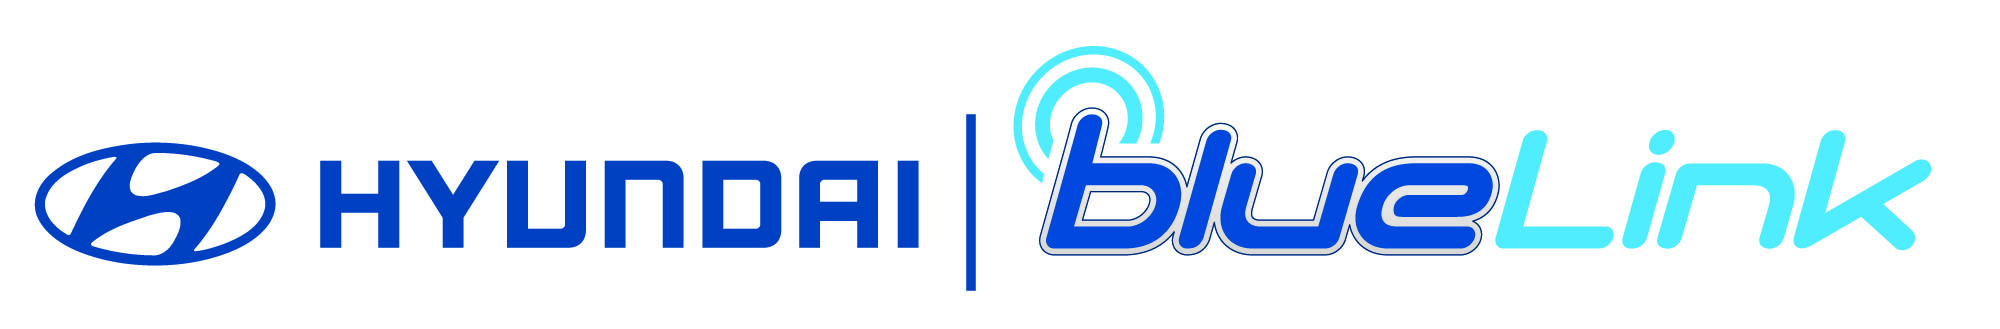 Hyundai BlueLink Logo Hyundai BlueLink Telematics HUB Hyundai West